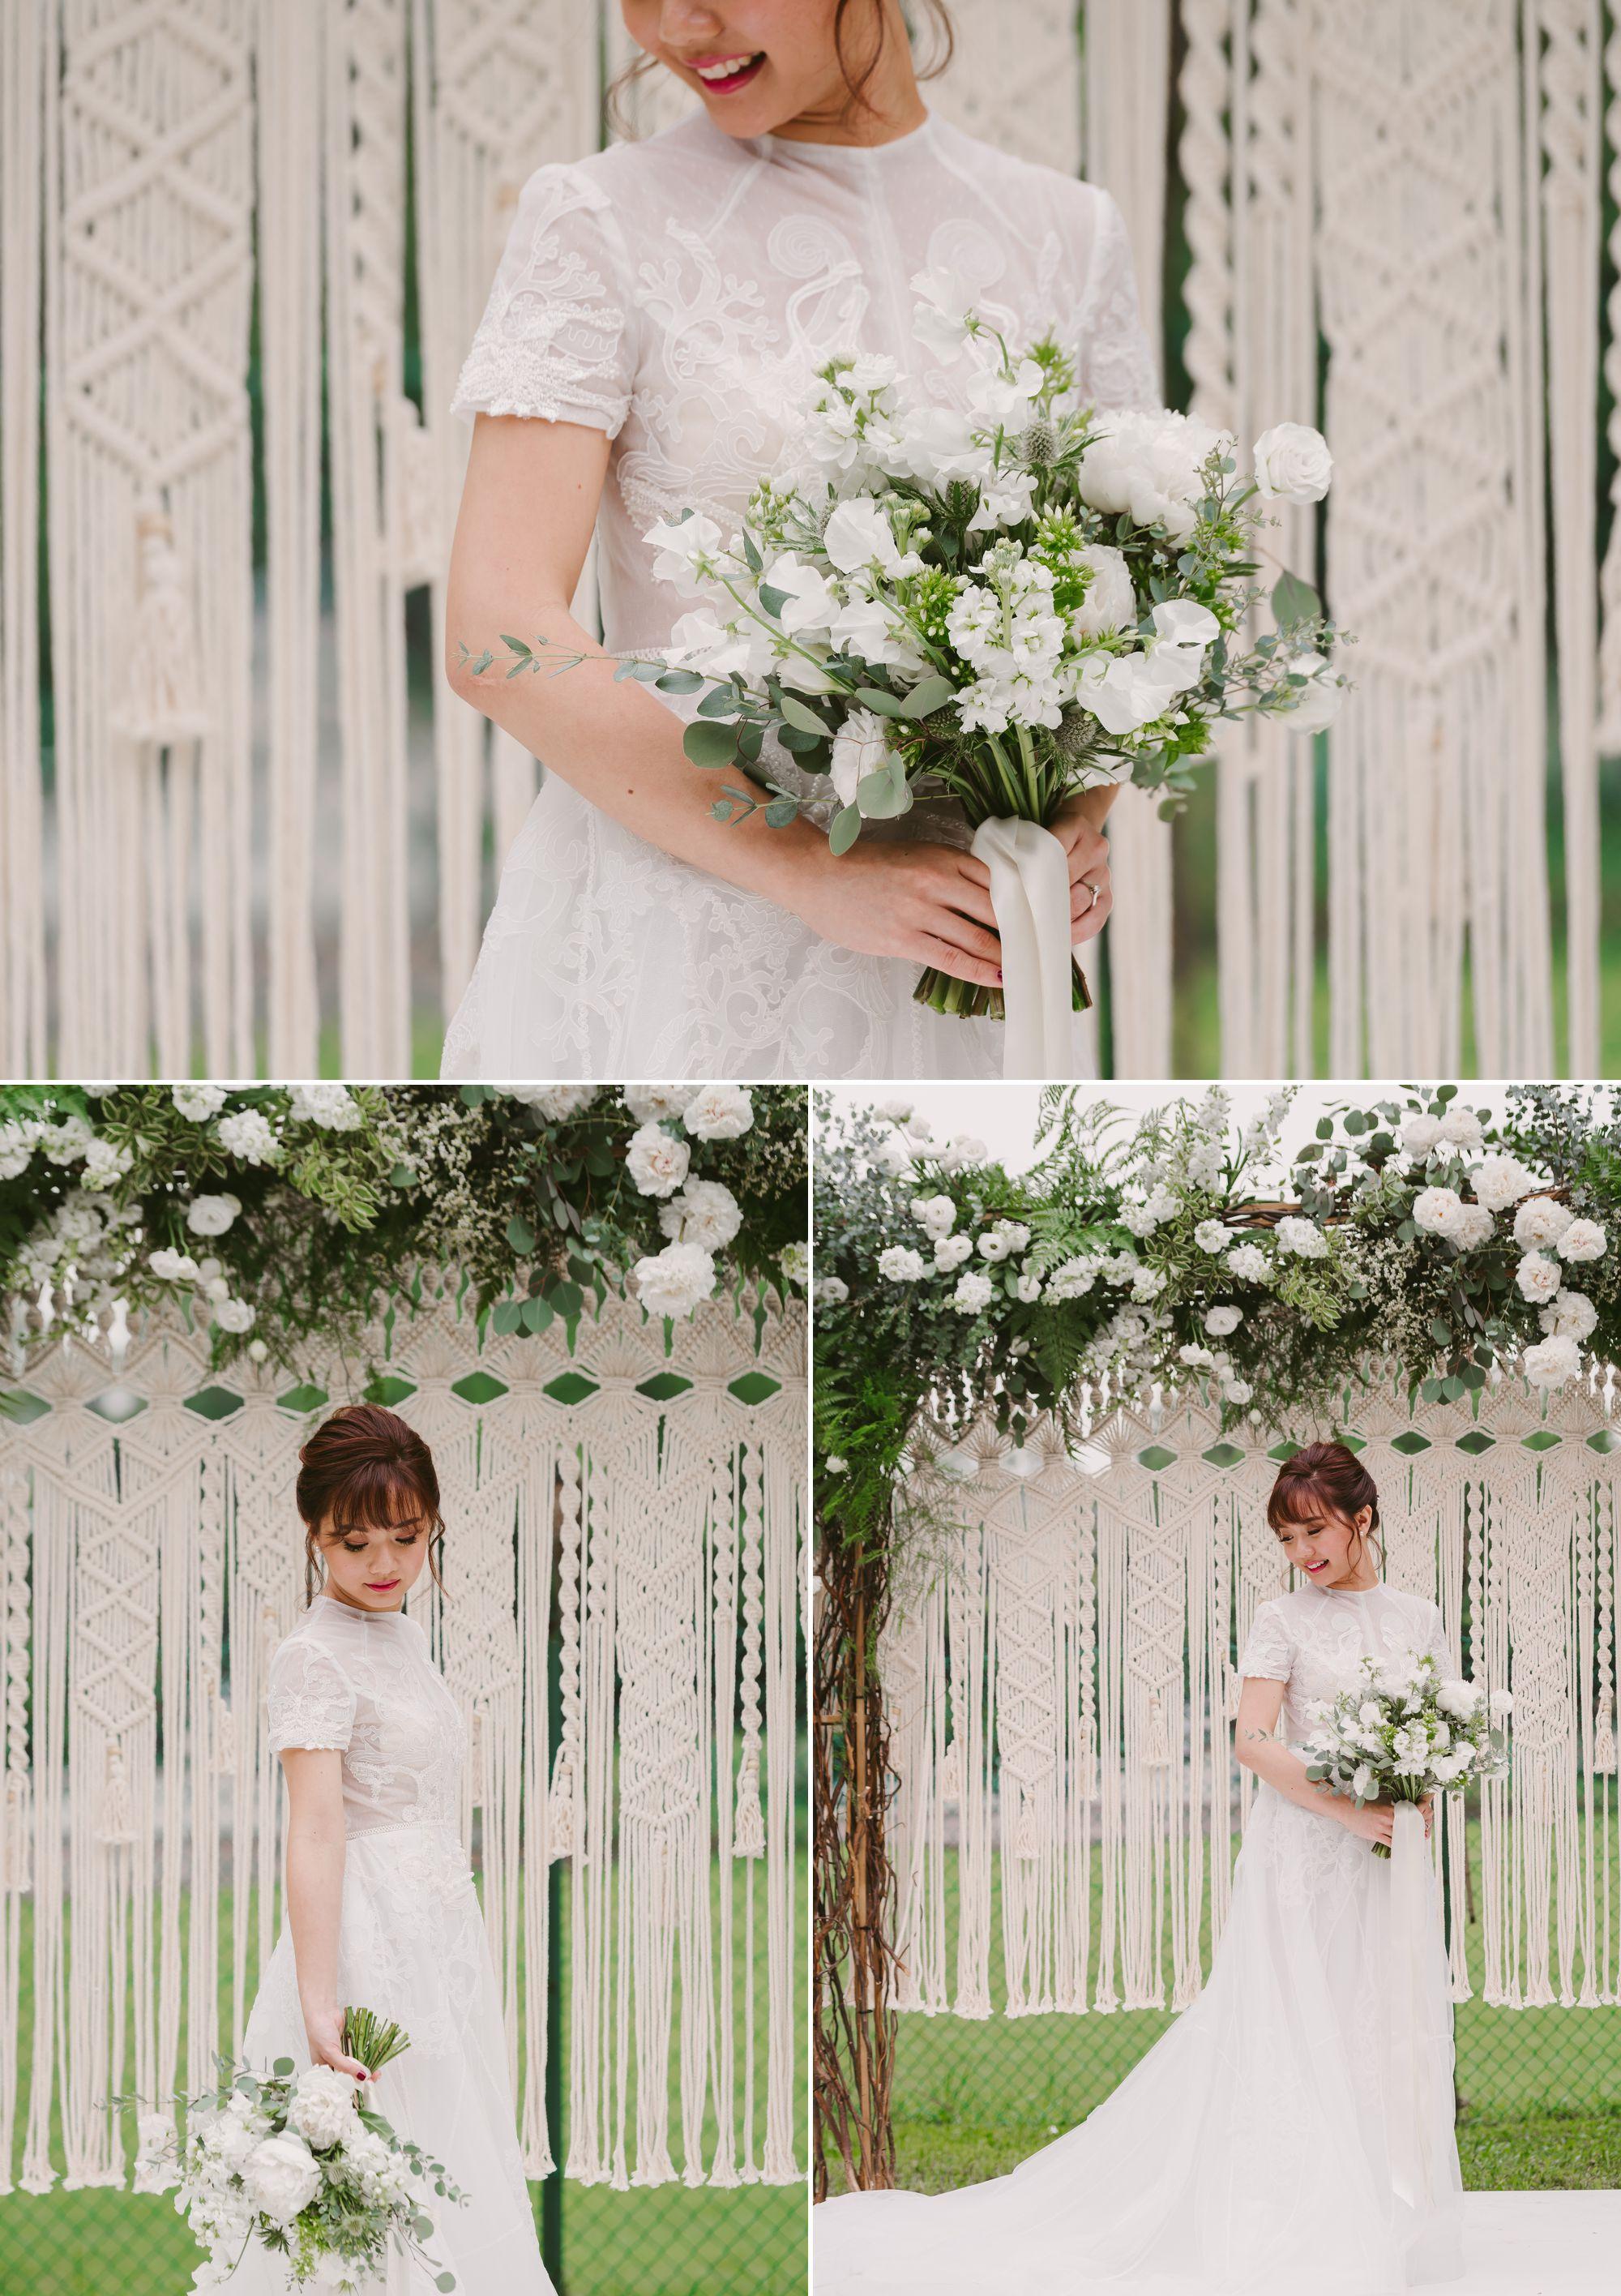 wedding_photography 22.jpg